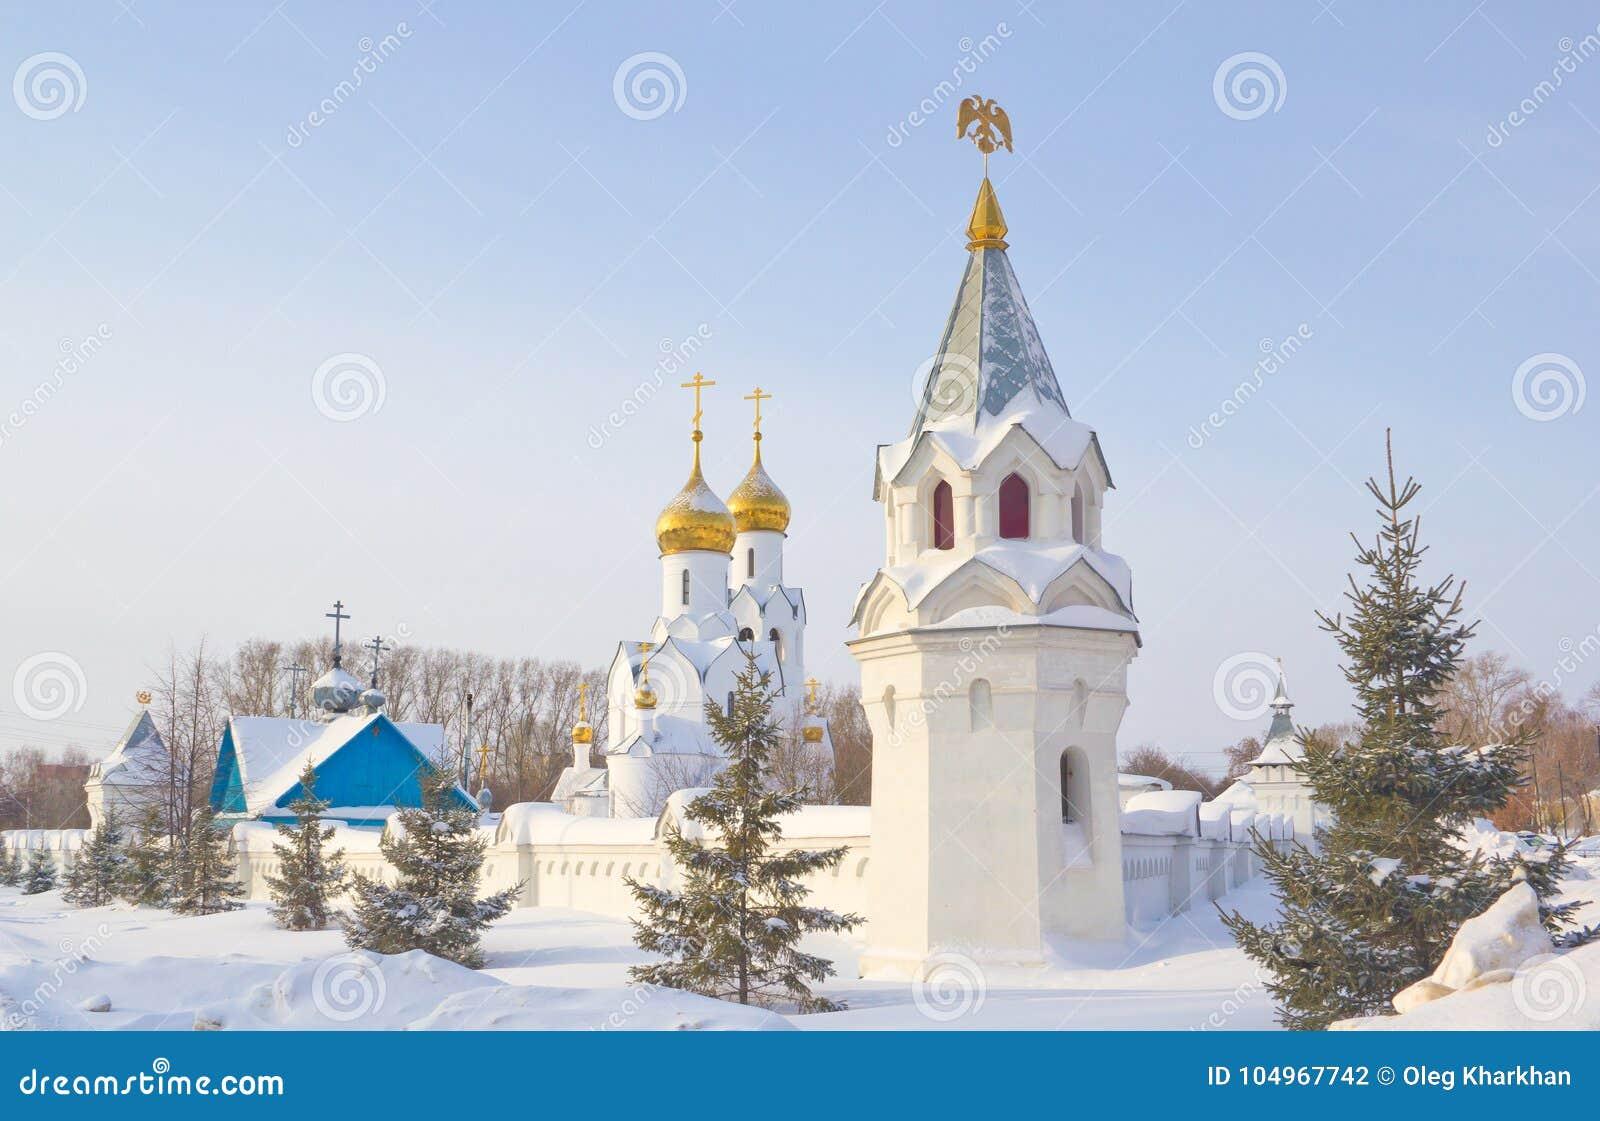 Archistrategos Mikhail kościół w Novosibirsk